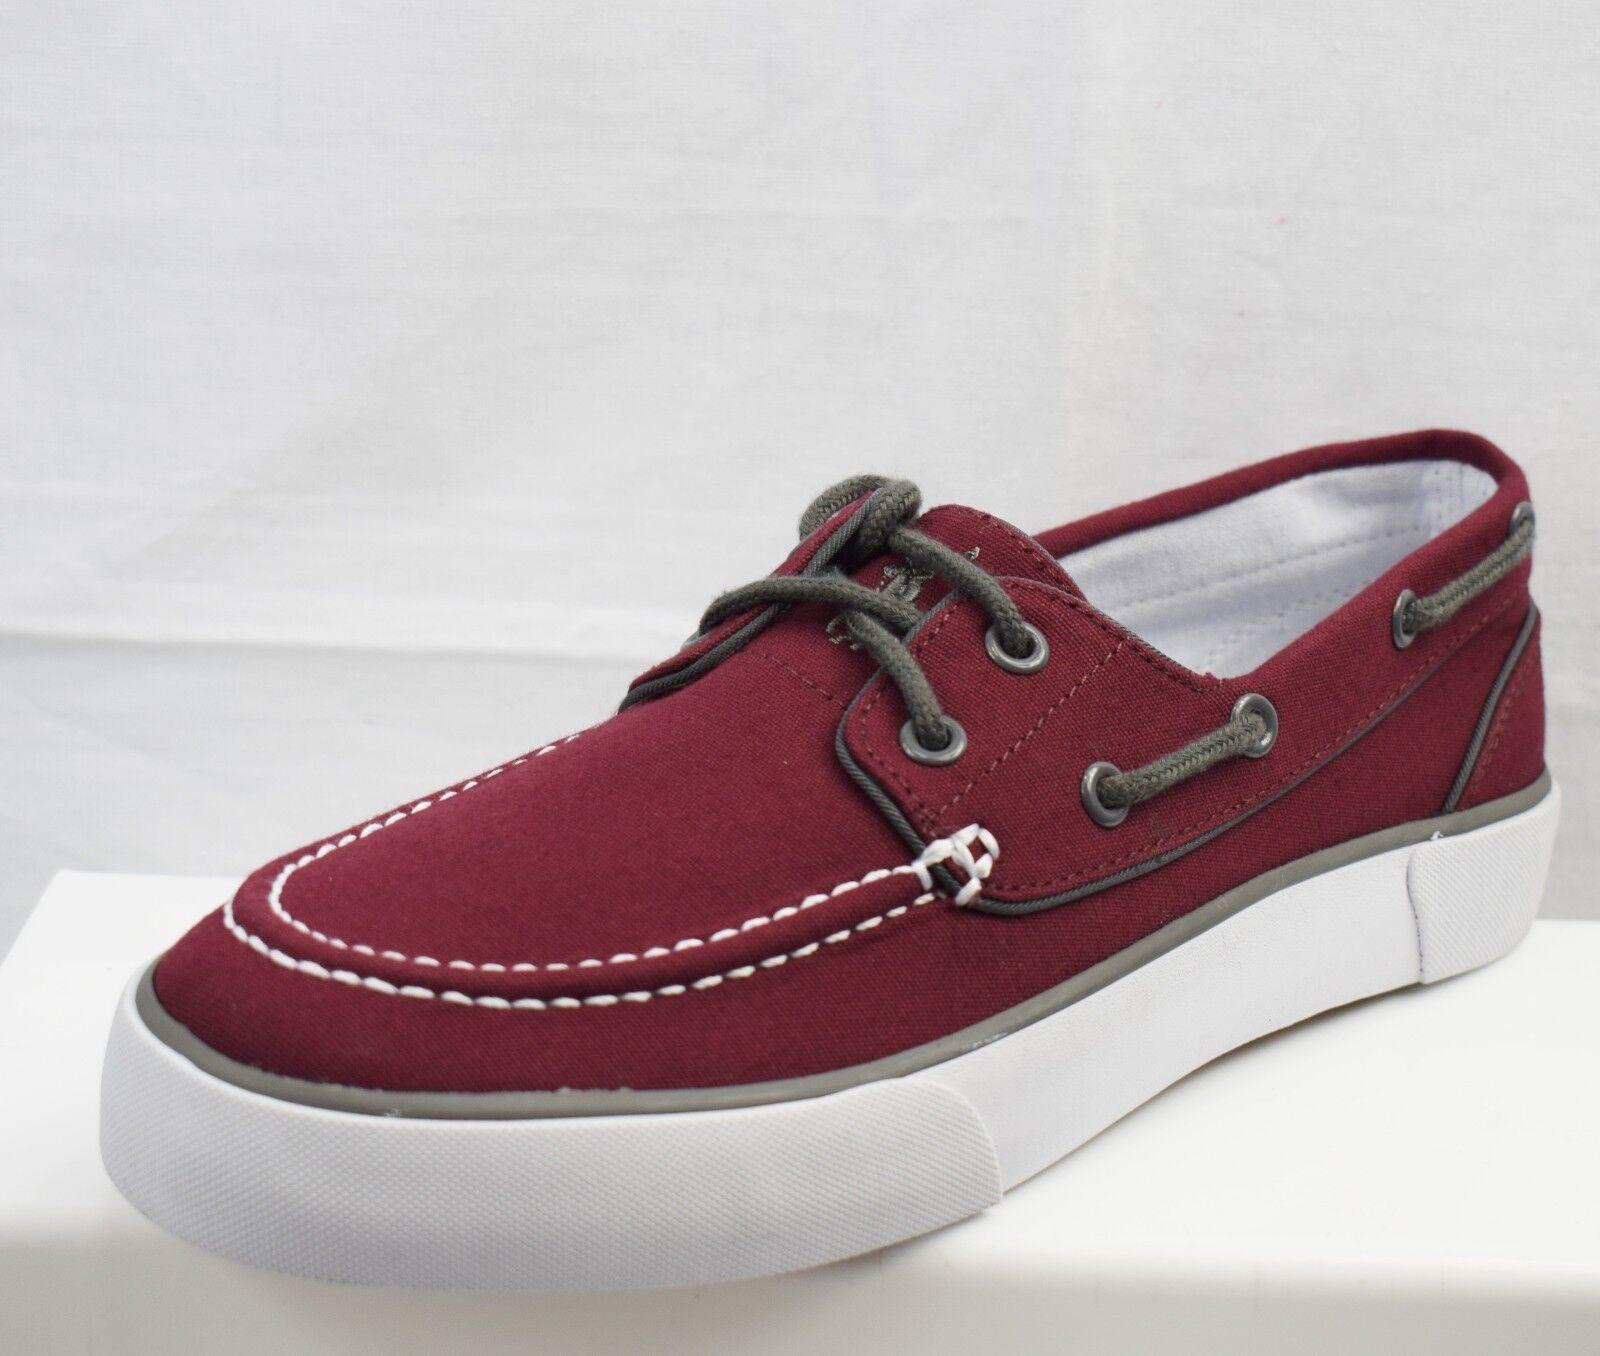 Polo Ralph Lauren Lander Hommes Chaussures Neuf Taille (EE9) (EE9) (EE9) d15b74